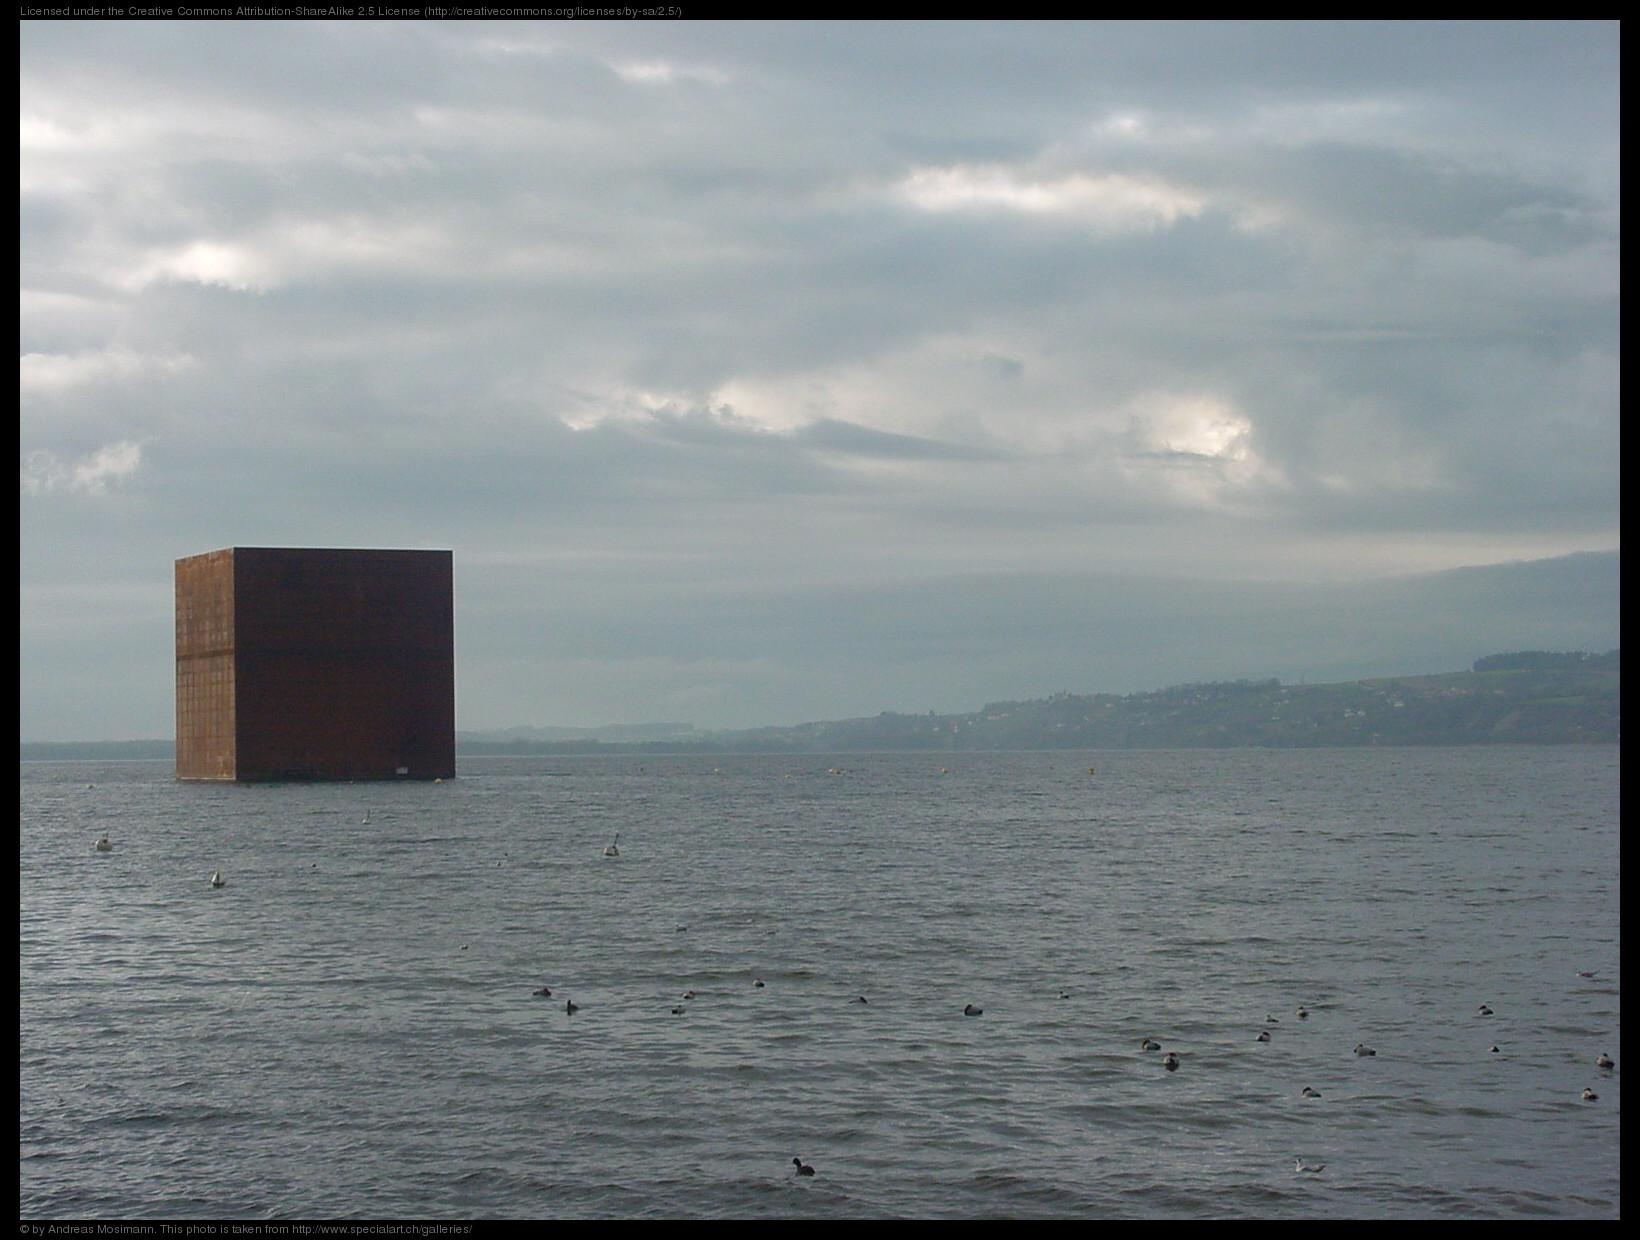 Monolith Size